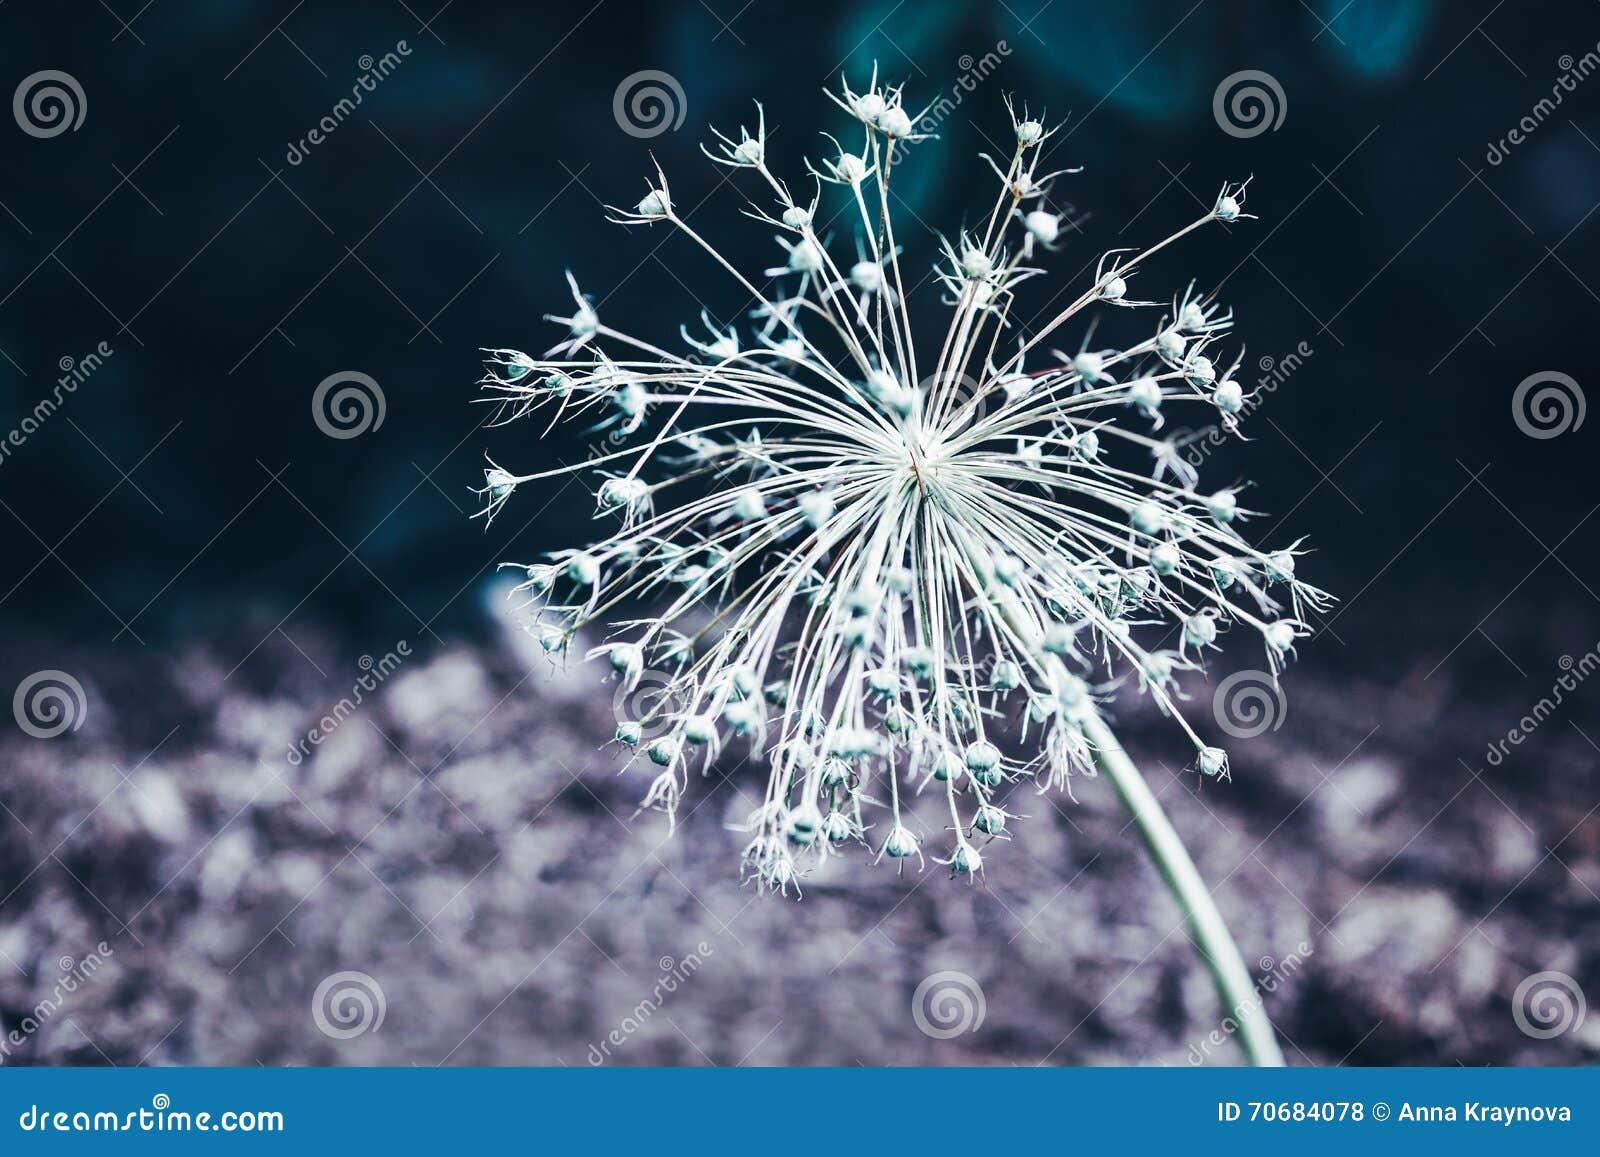 Beautiful Fairy Dreamy Magic White Flower With Dark Green ...